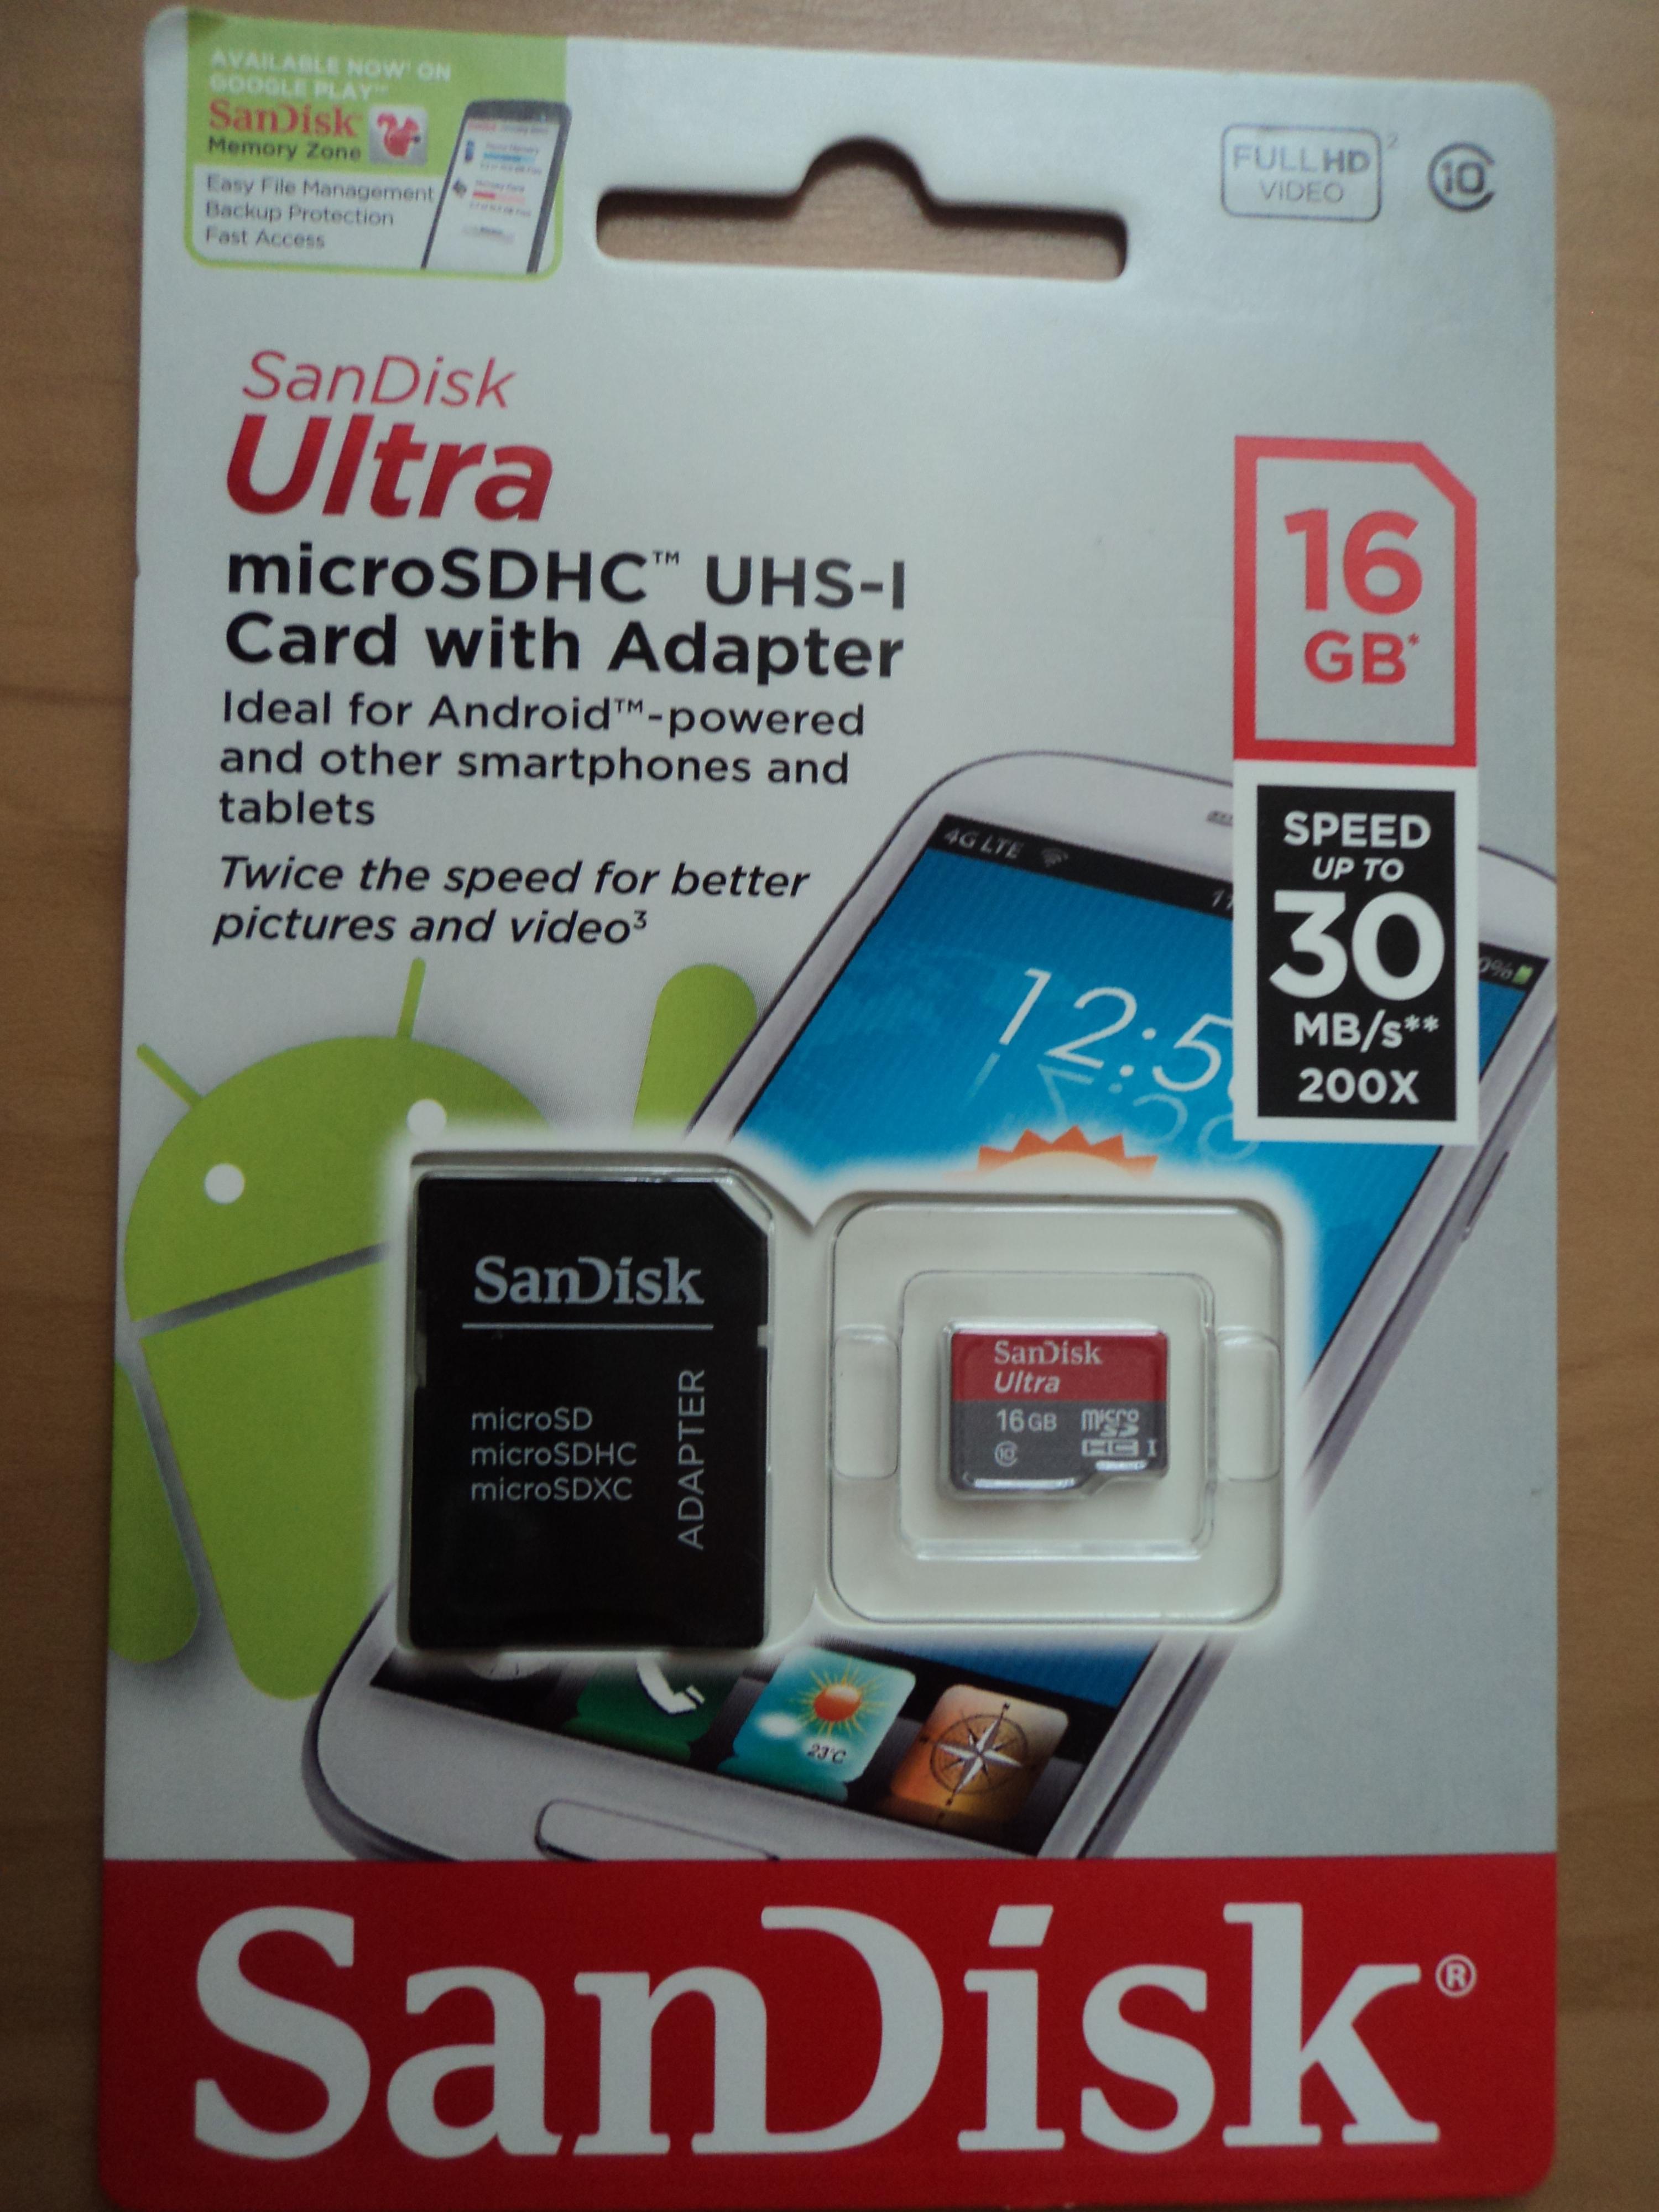 [Sprzedam] SanDisk Ultra microSDHC 16 GB UHS-I +adapter